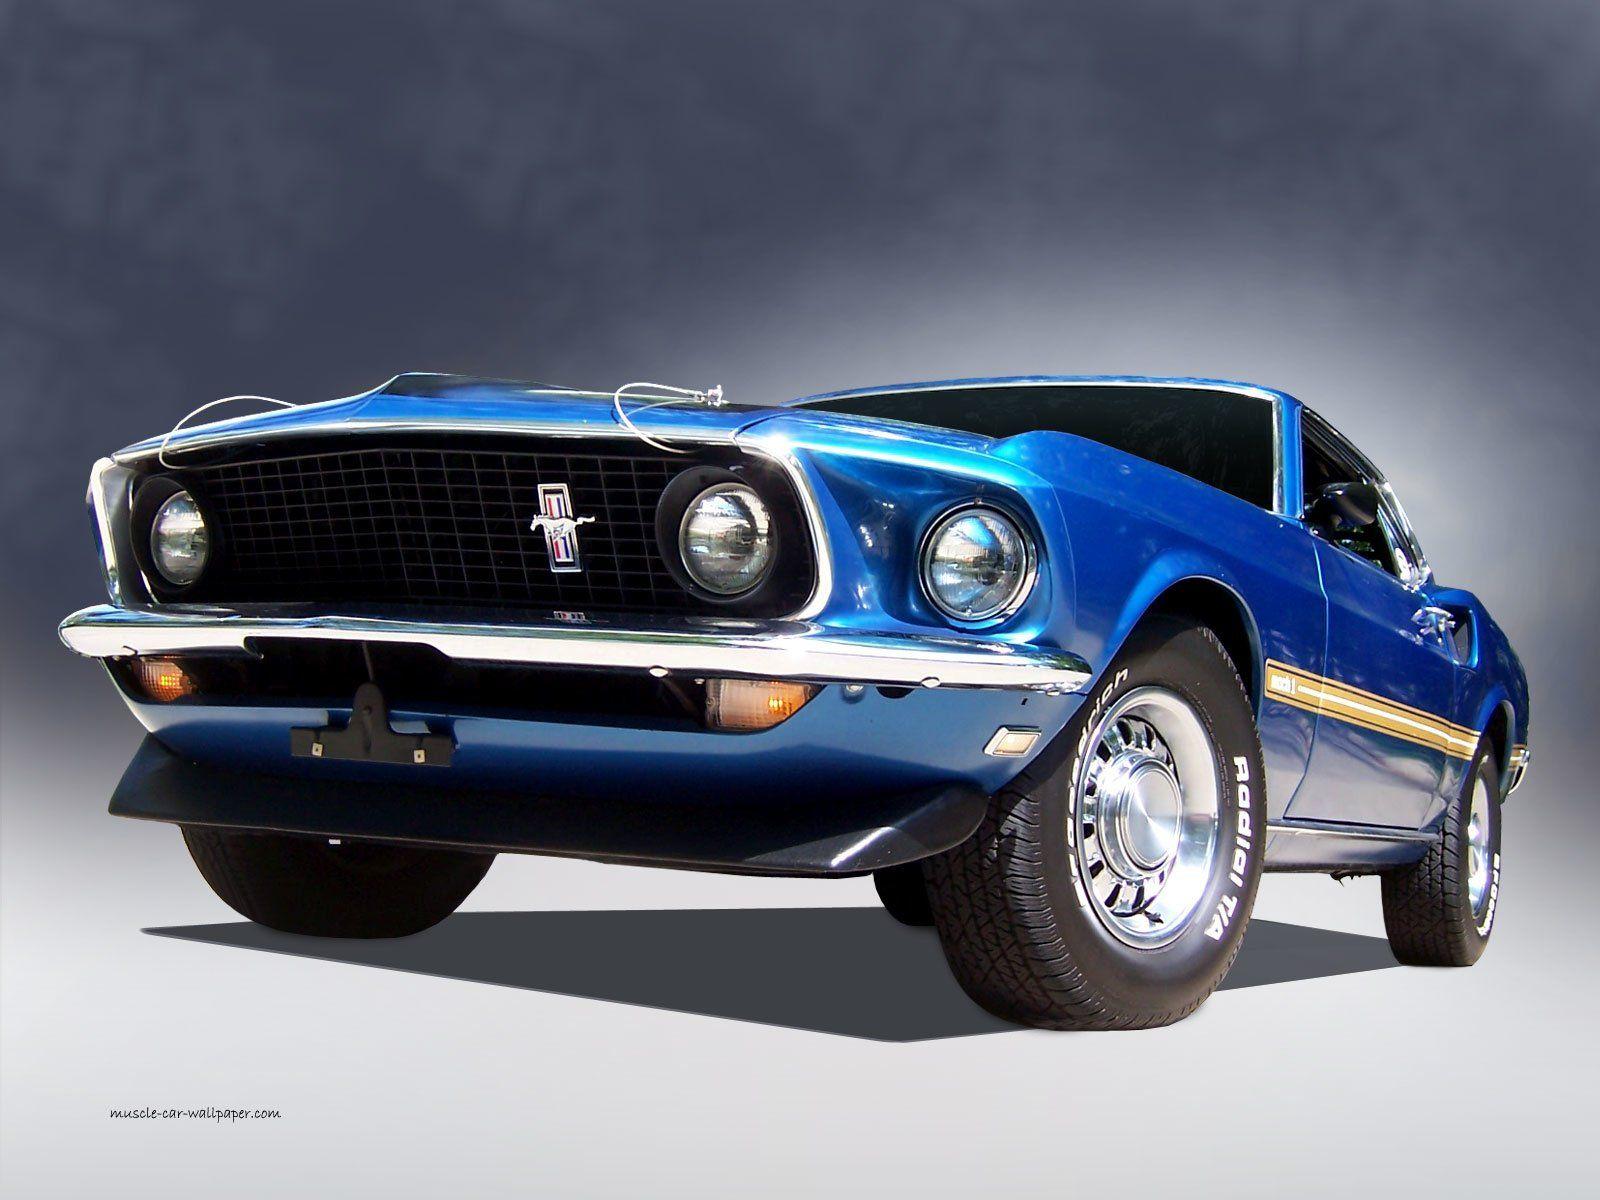 Mustang Wallpaper Hd Zjd Ford Mustang Dream Cars Mustang